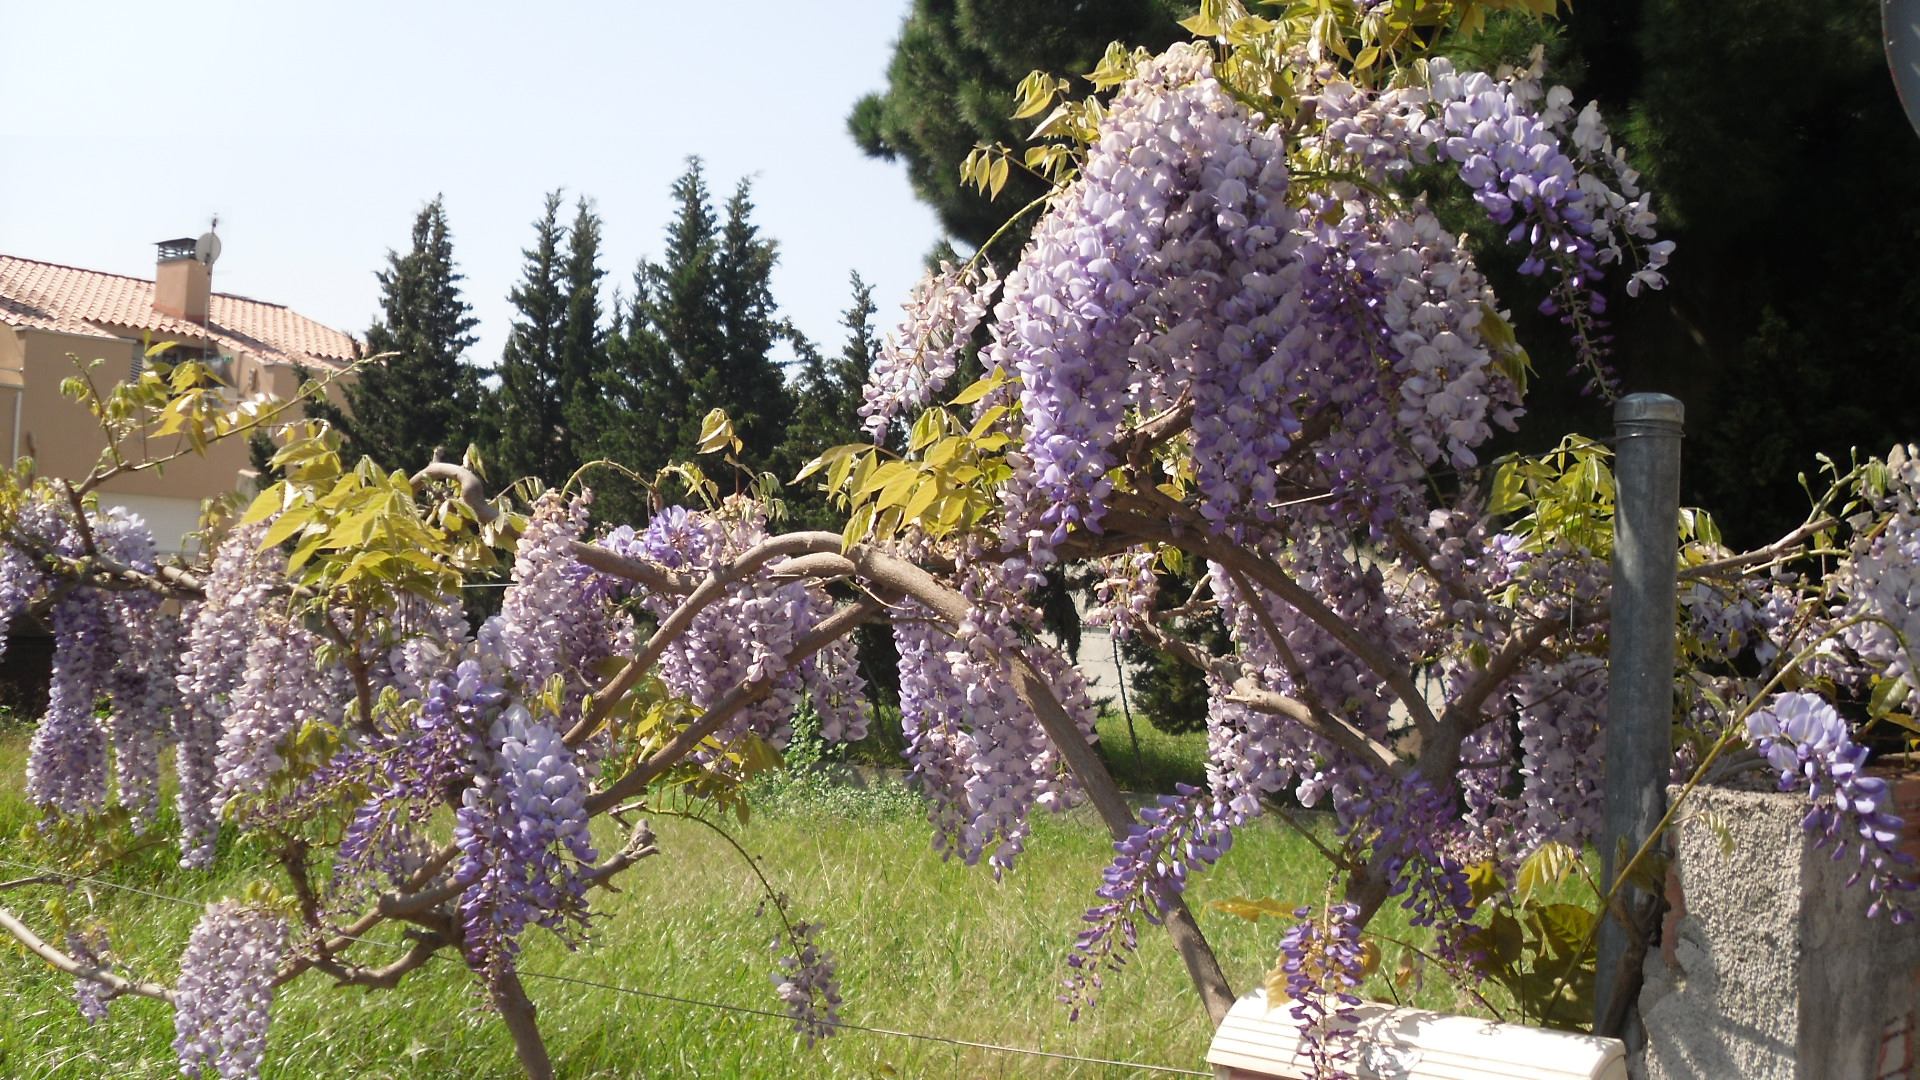 Semillas de glicinia wisteria sinensis spicegarden - Glicinia en maceta ...